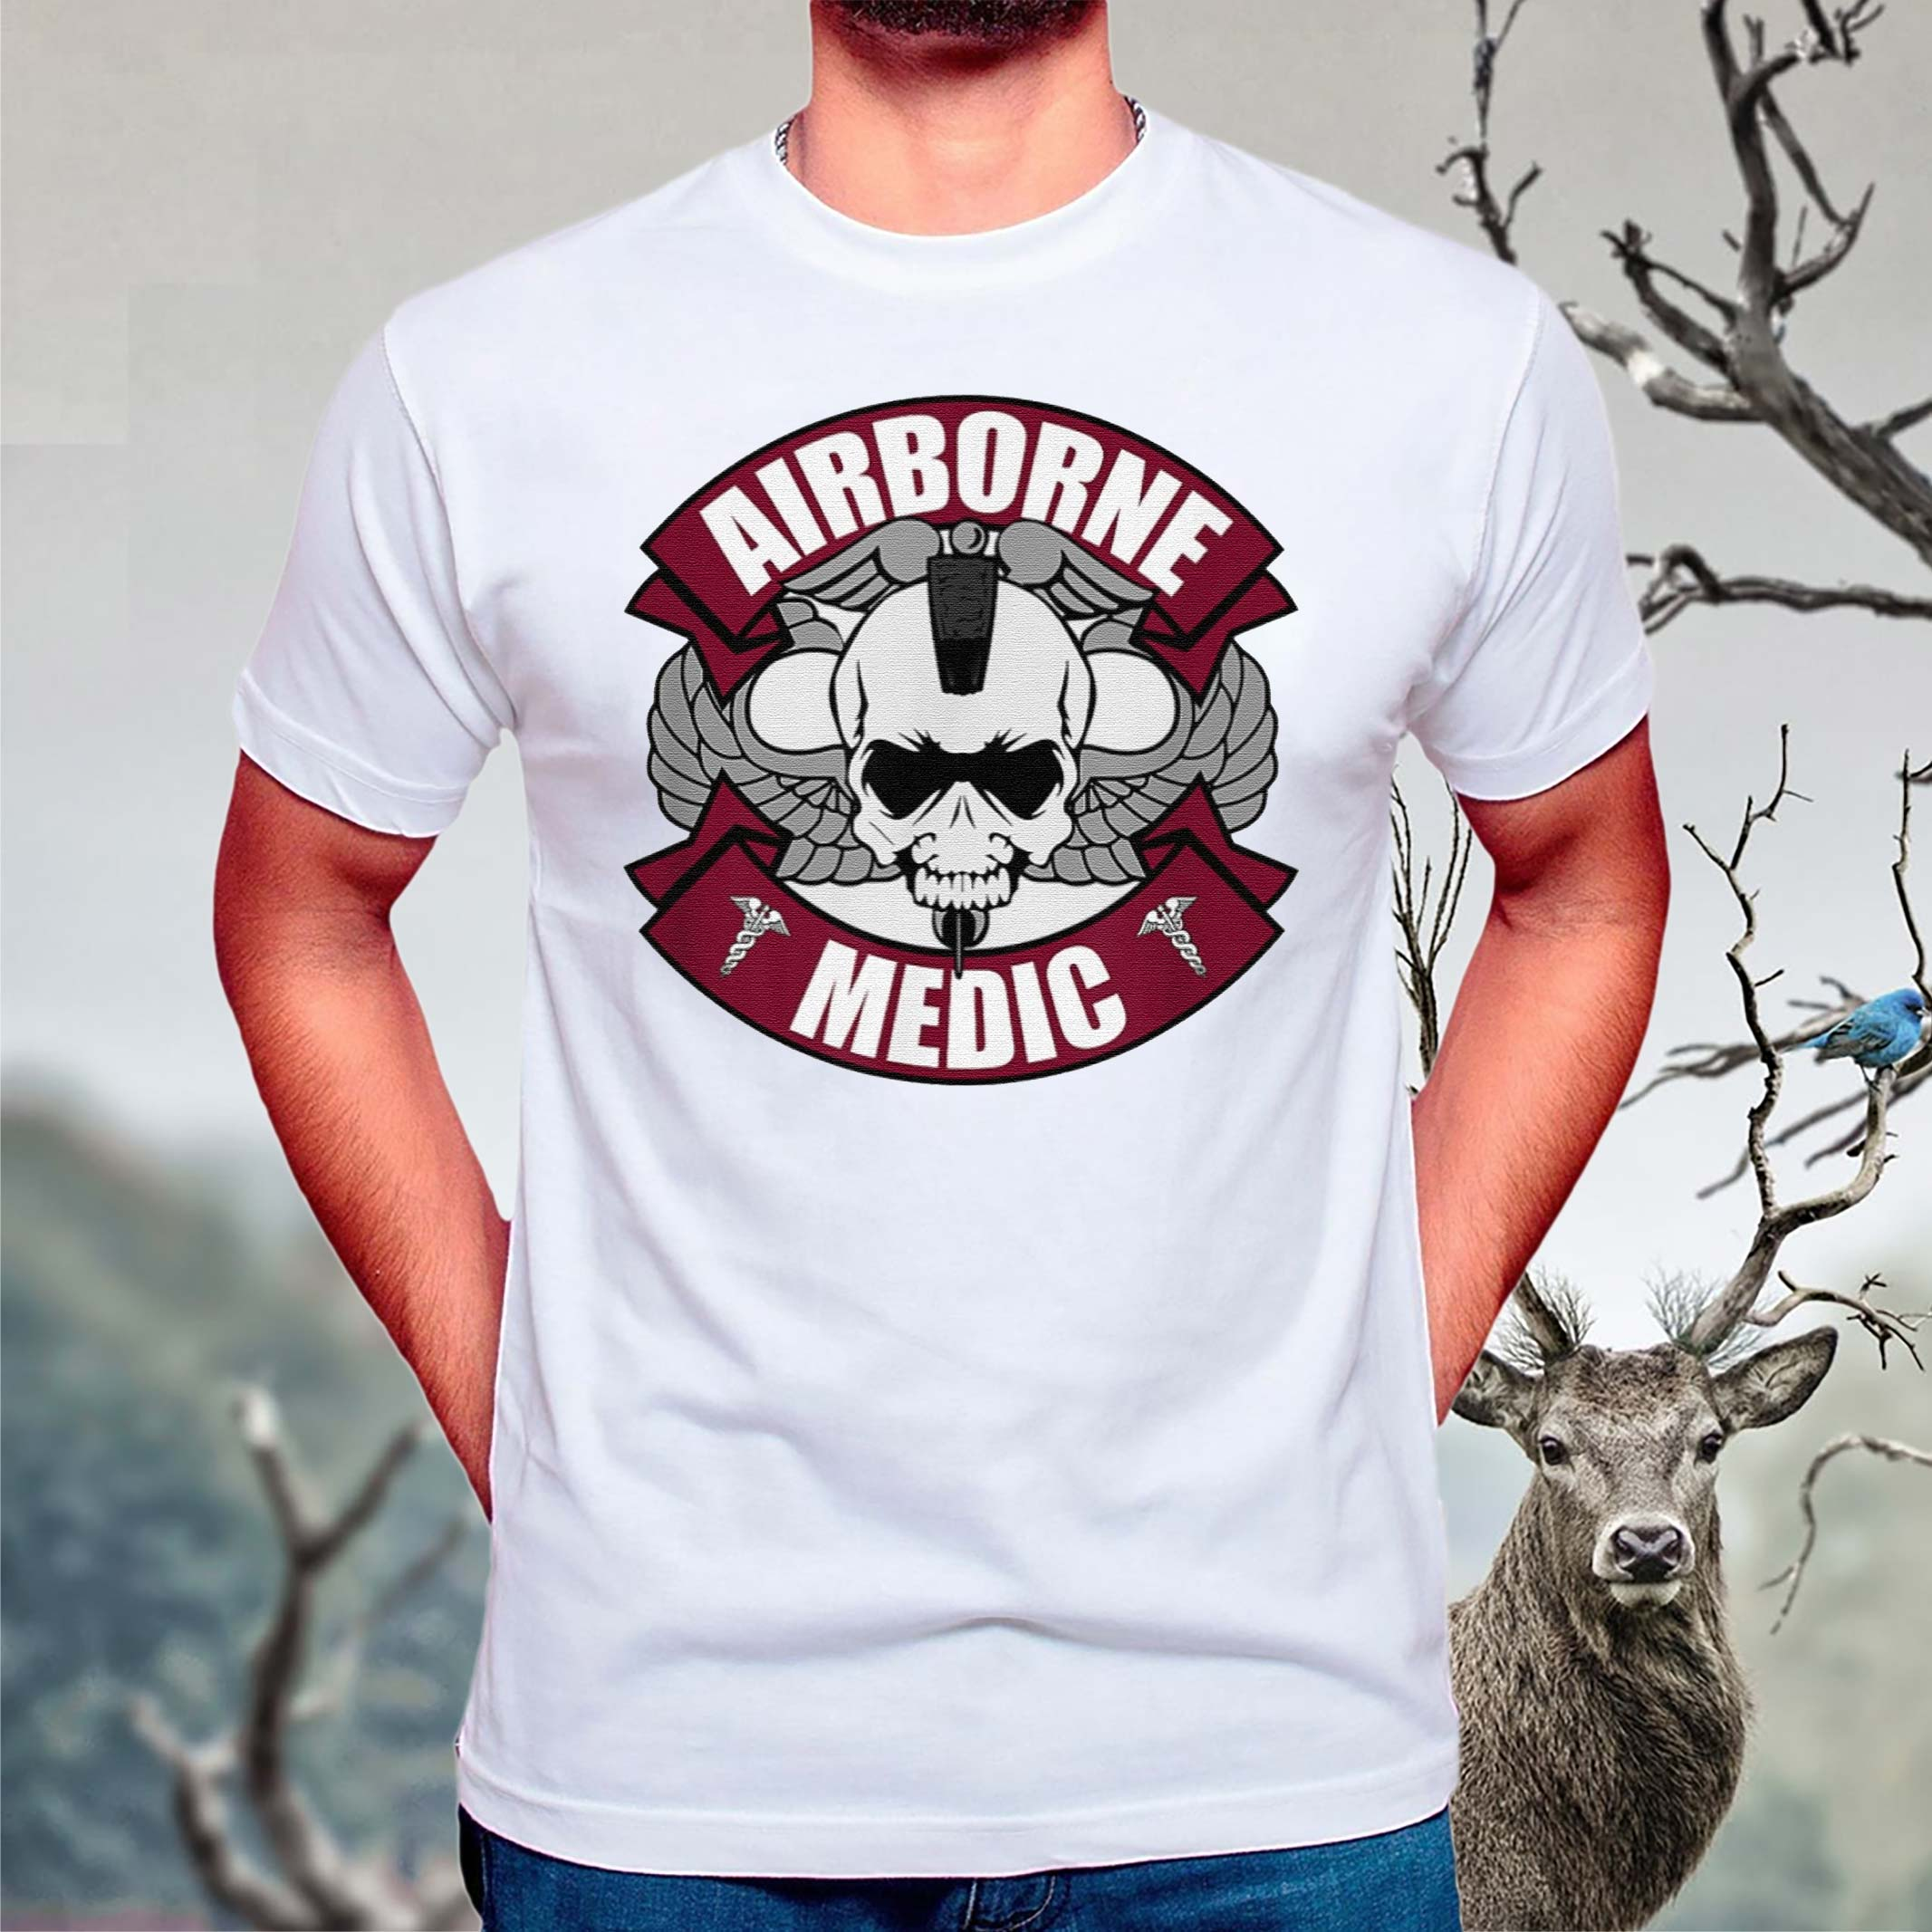 Airborne-Medic-T-Shirt